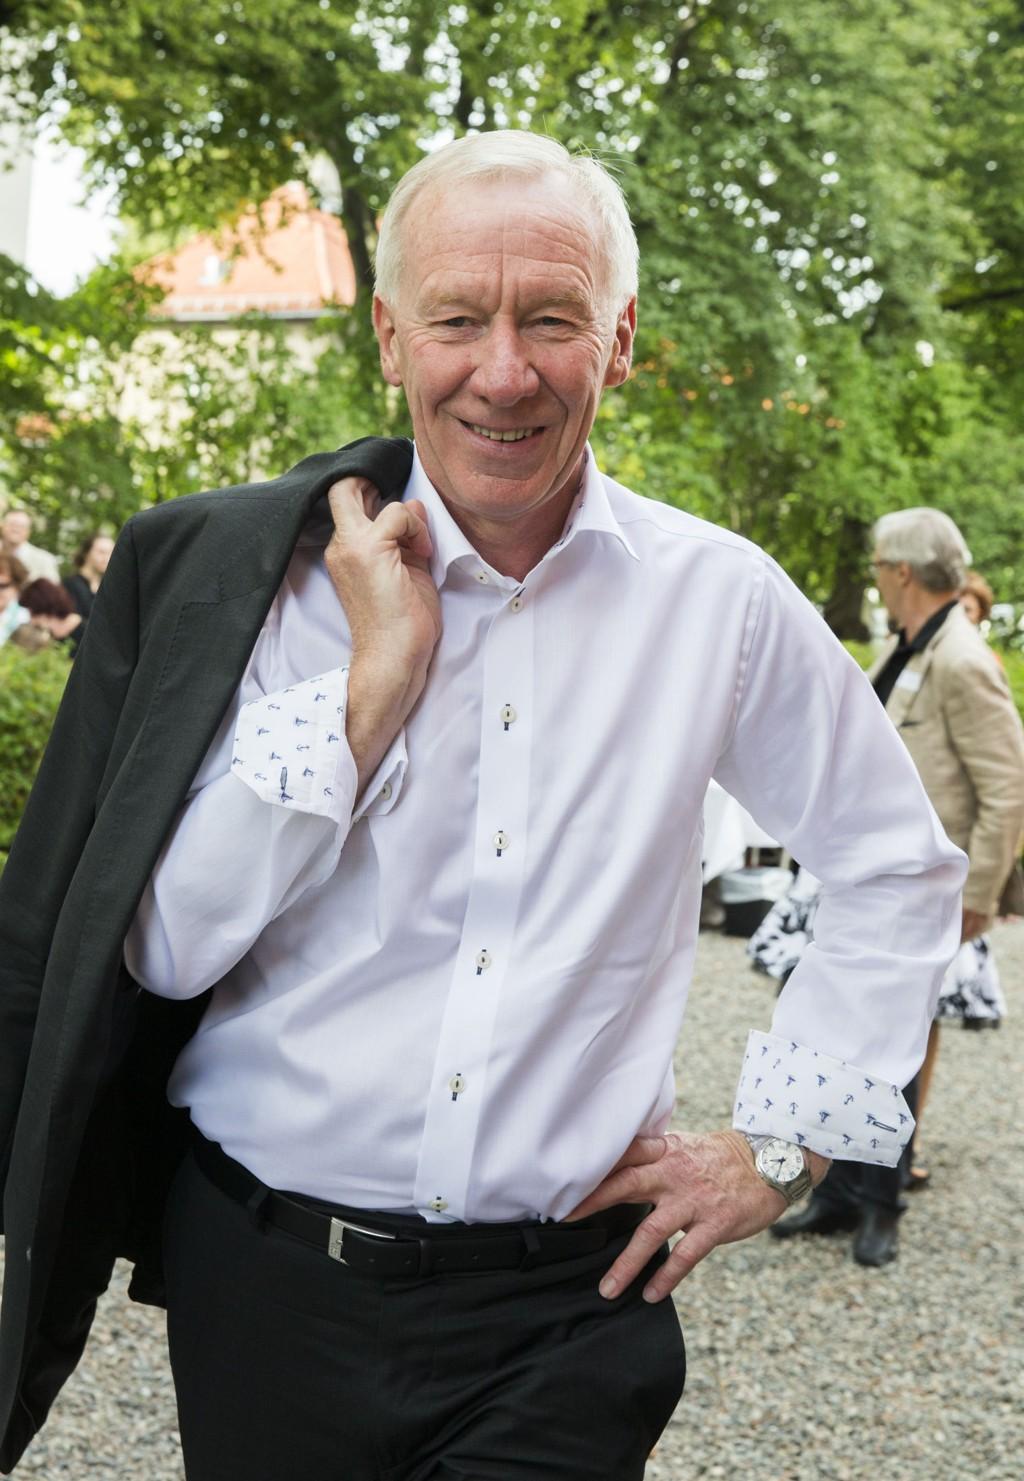 Oslo 20130829. Alf Hildrum på hagefesten til Aschehoug forlag torsdag ettermiddag Foto: Berit Roald / NTB scanpix